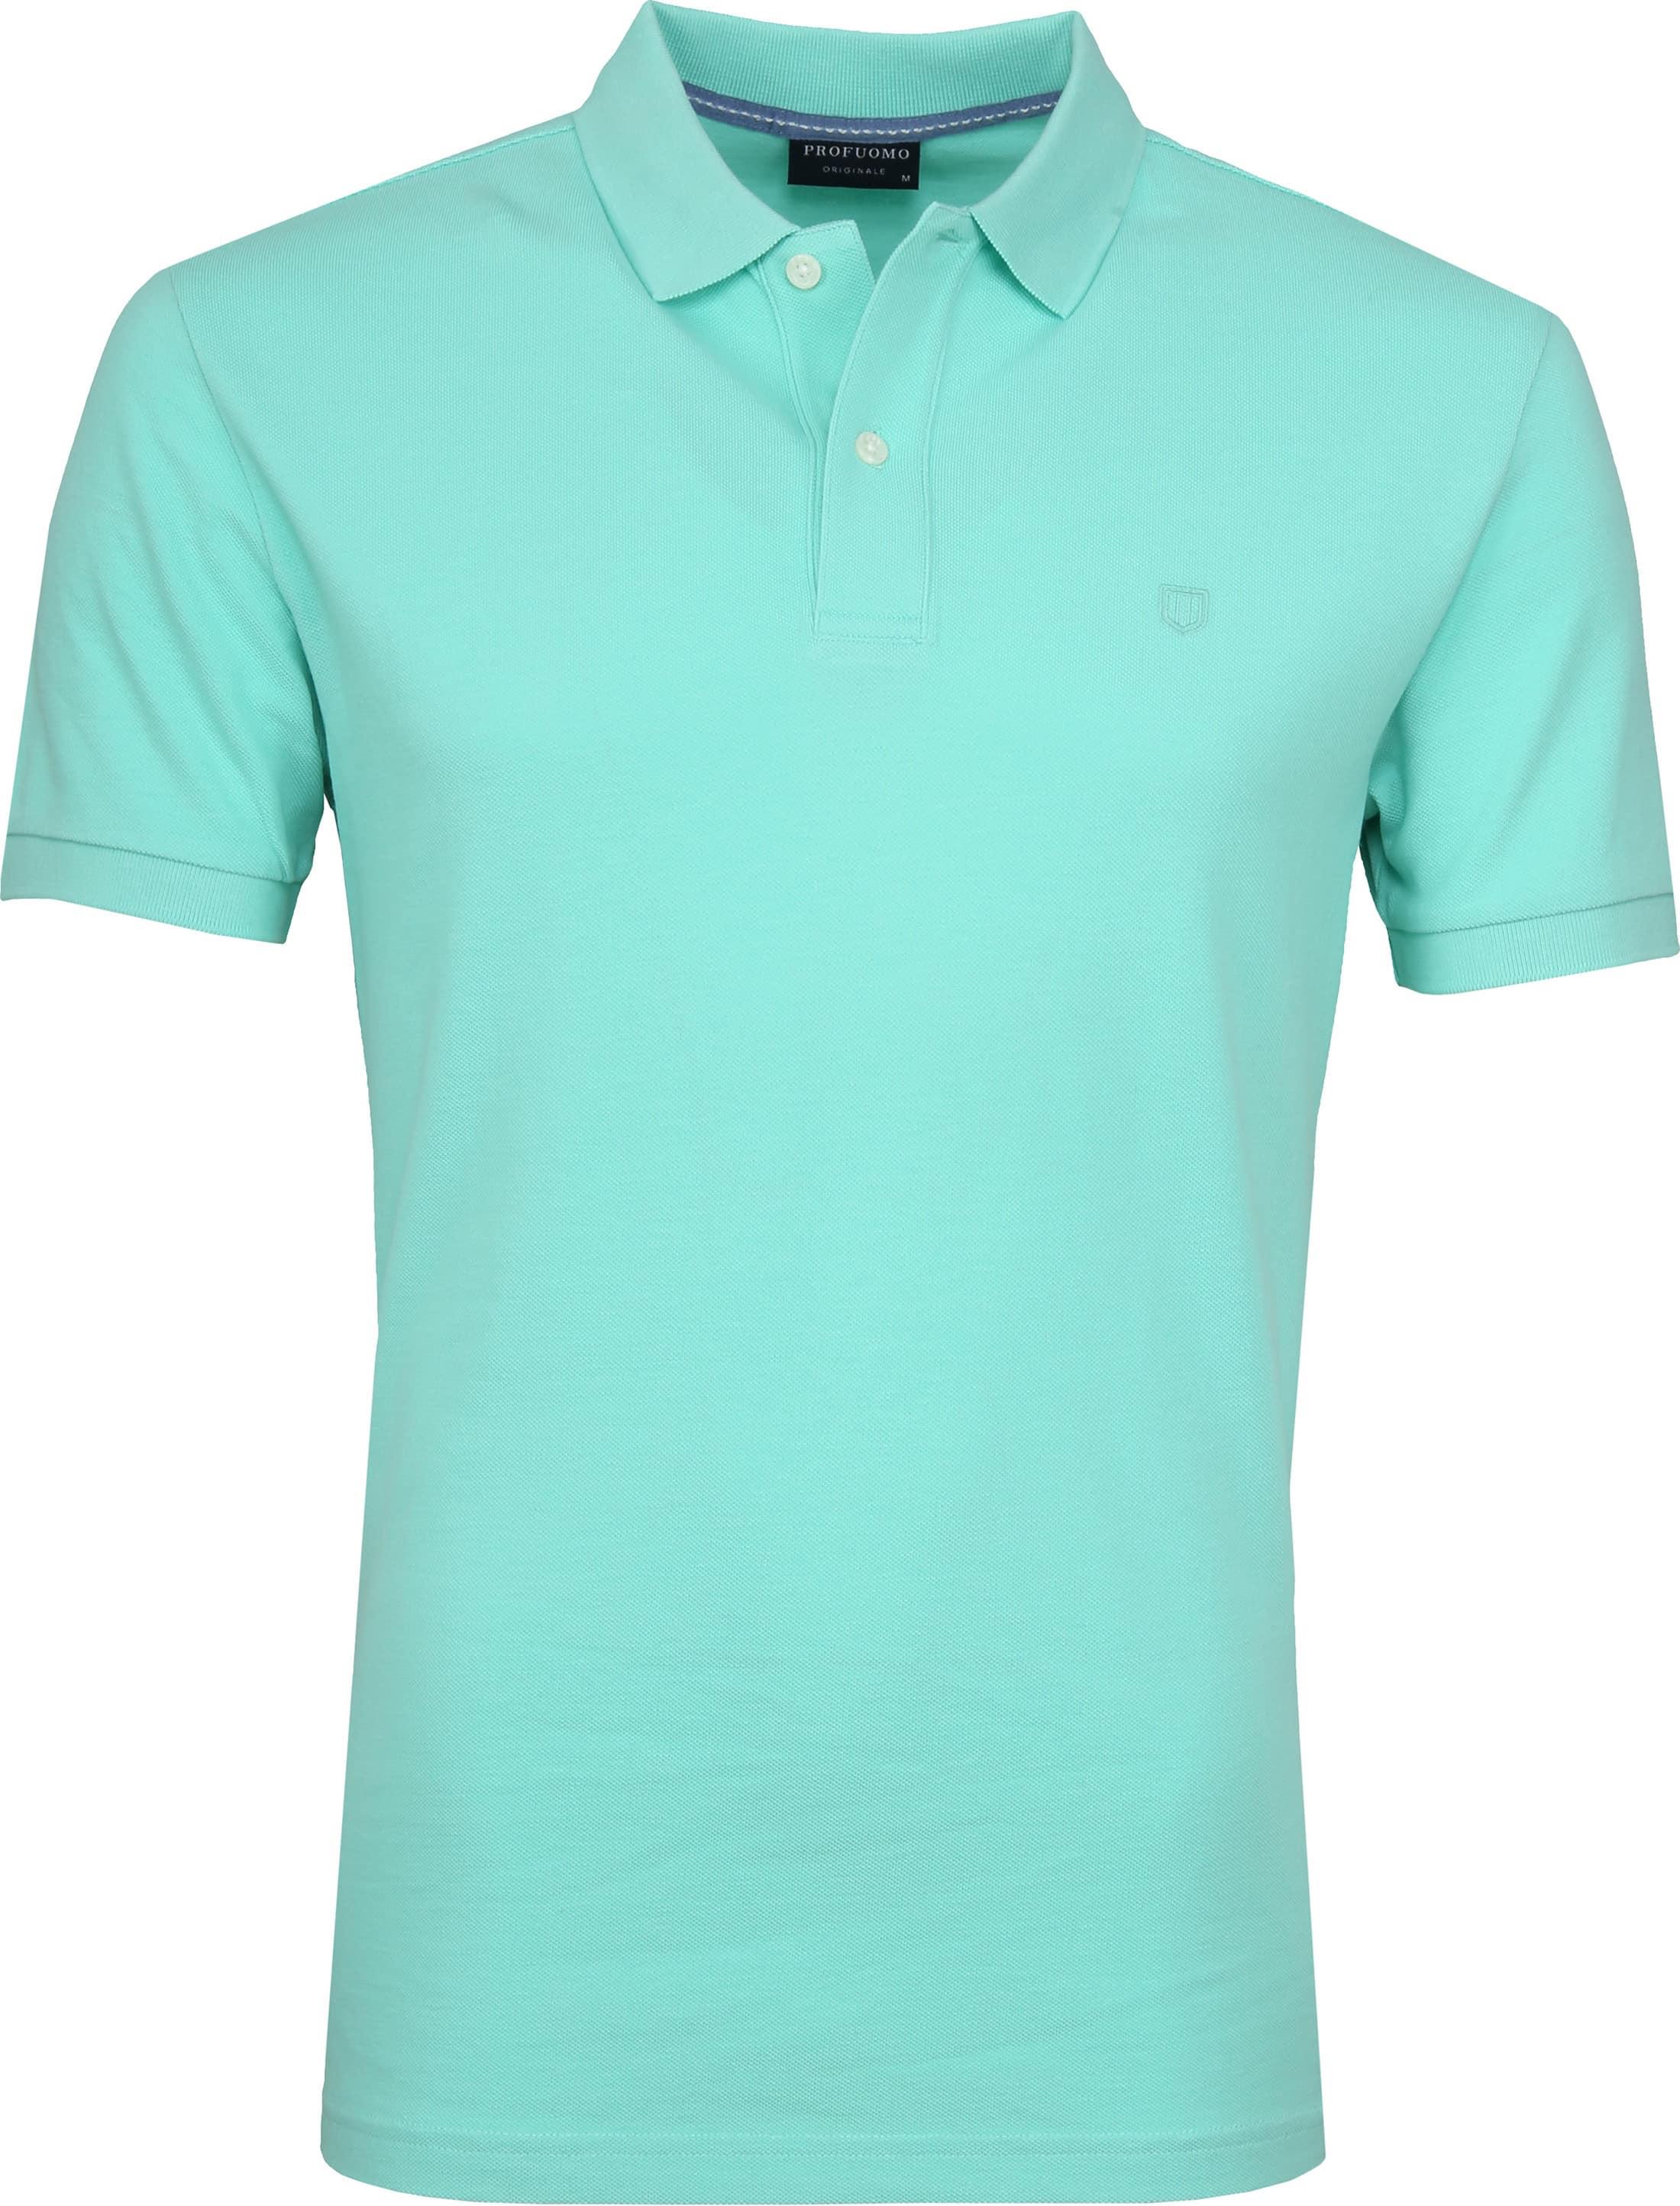 Profuomo Short Sleeve Poloshirt Minze foto 0